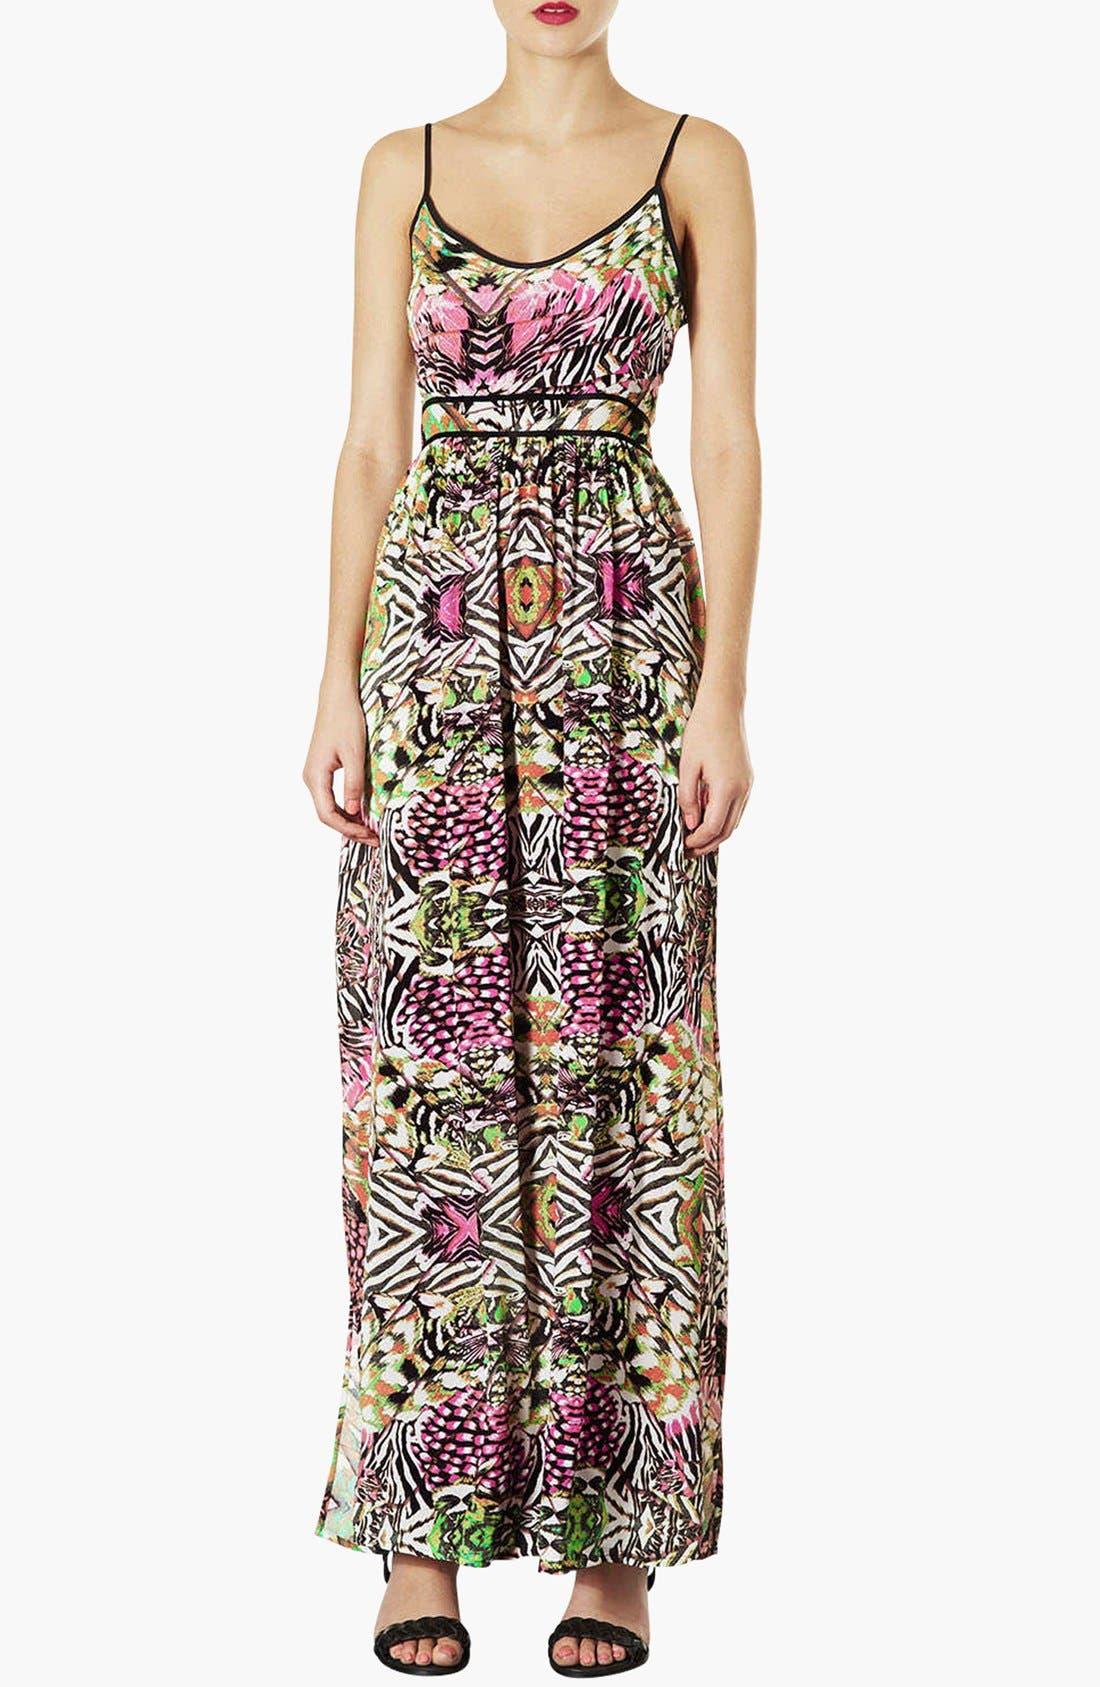 Alternate Image 1 Selected - Topshop 'Solarized' Print Maxi Dress